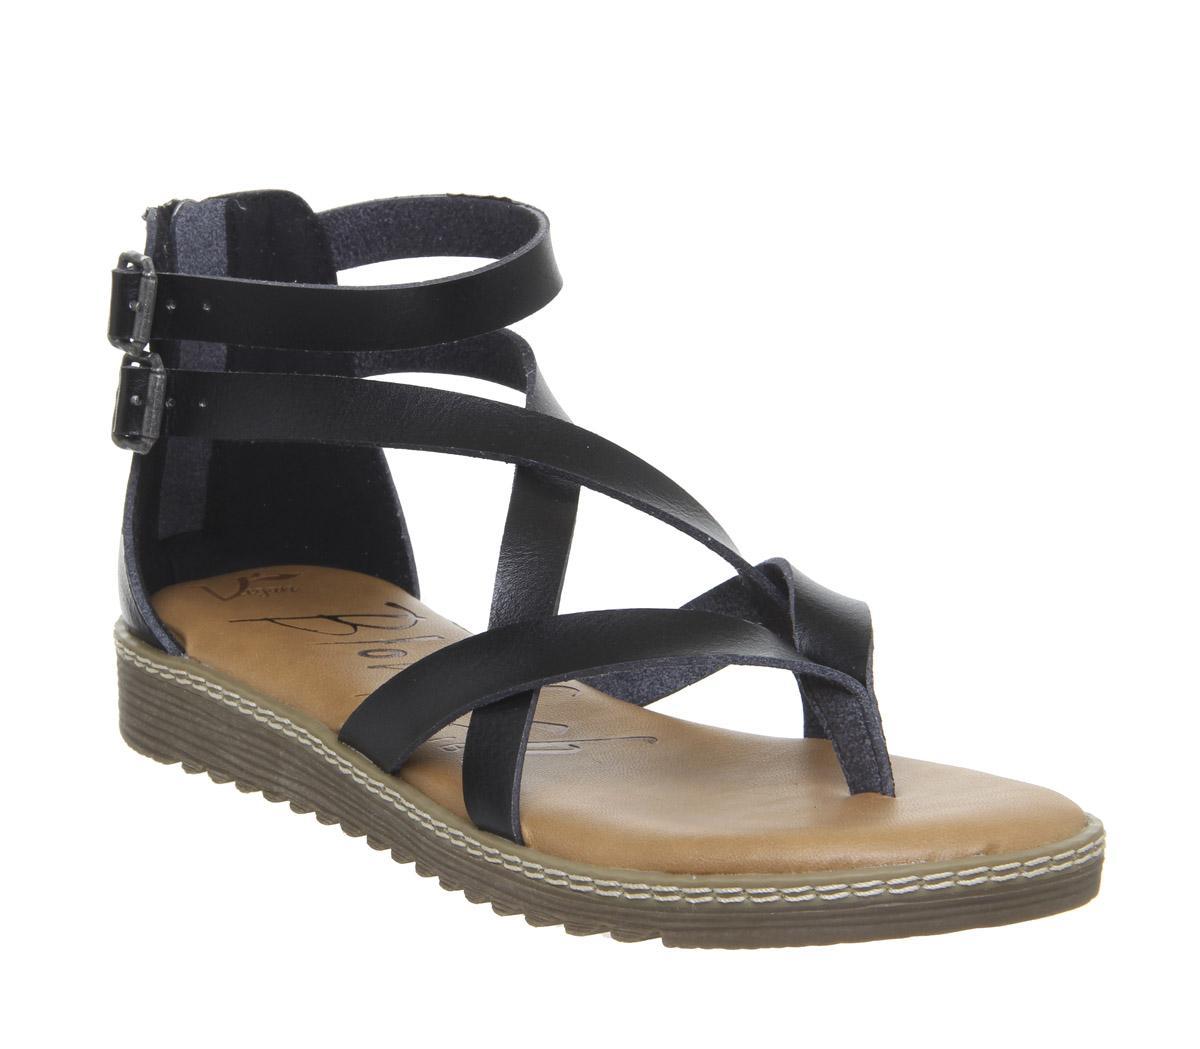 Blowfish Malibu Ohio Sandal Black - Sandals